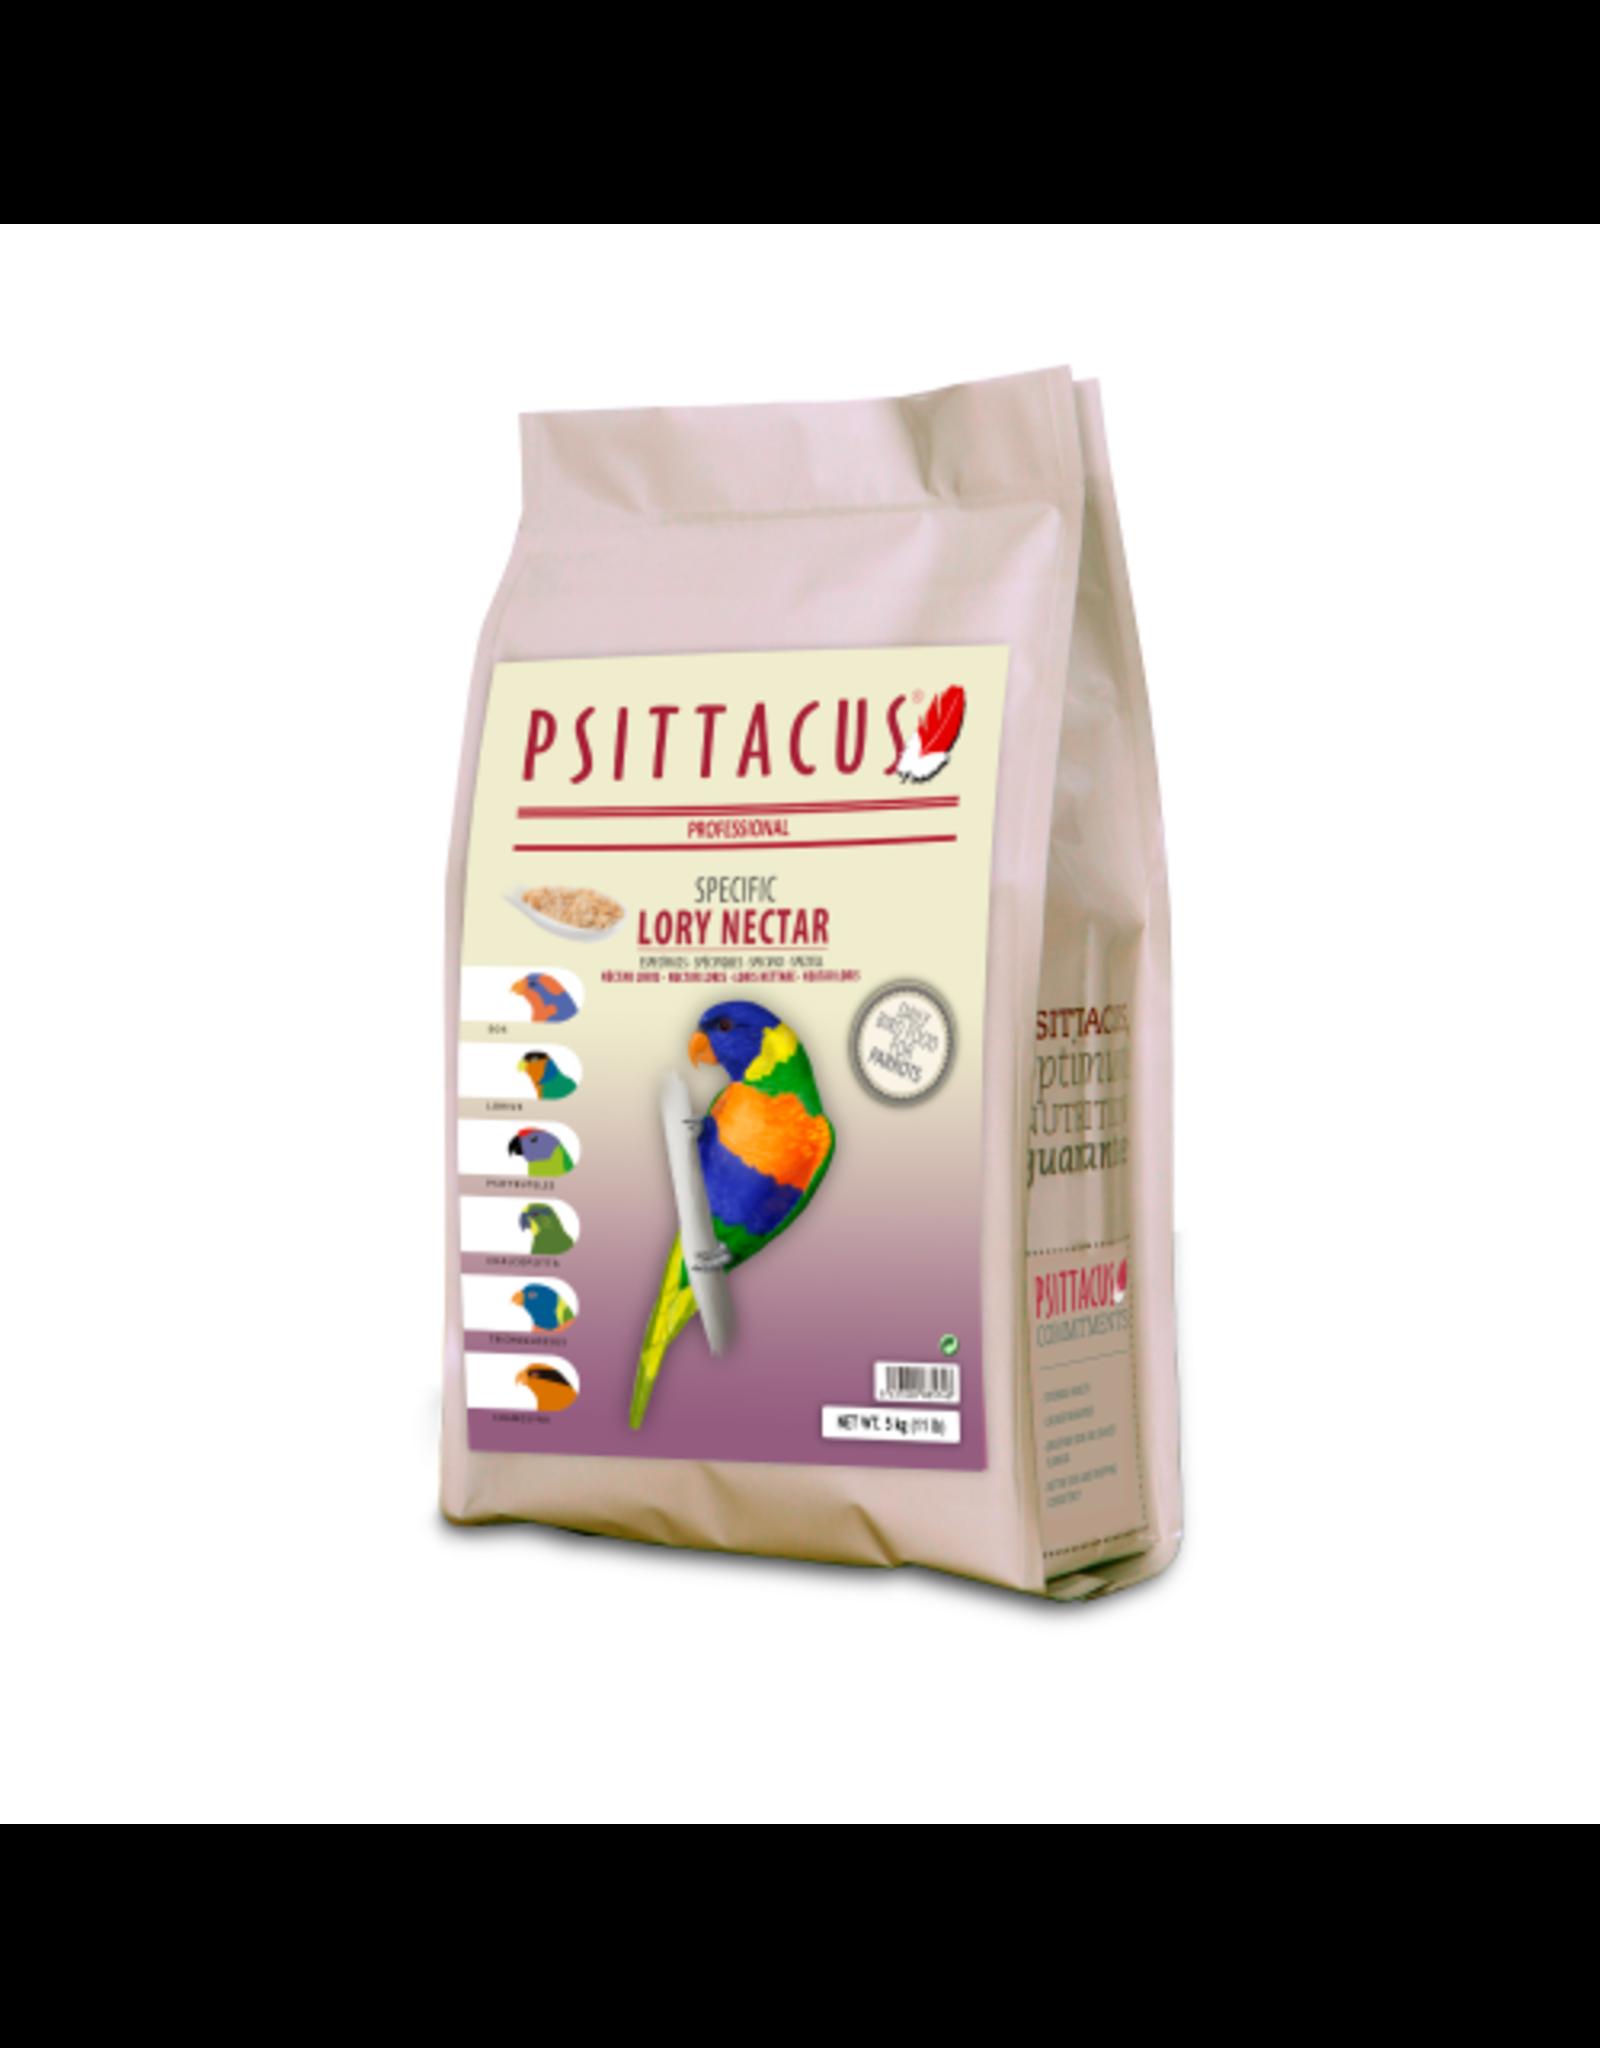 Psittacus Lories nectar 2lbs 3 oz